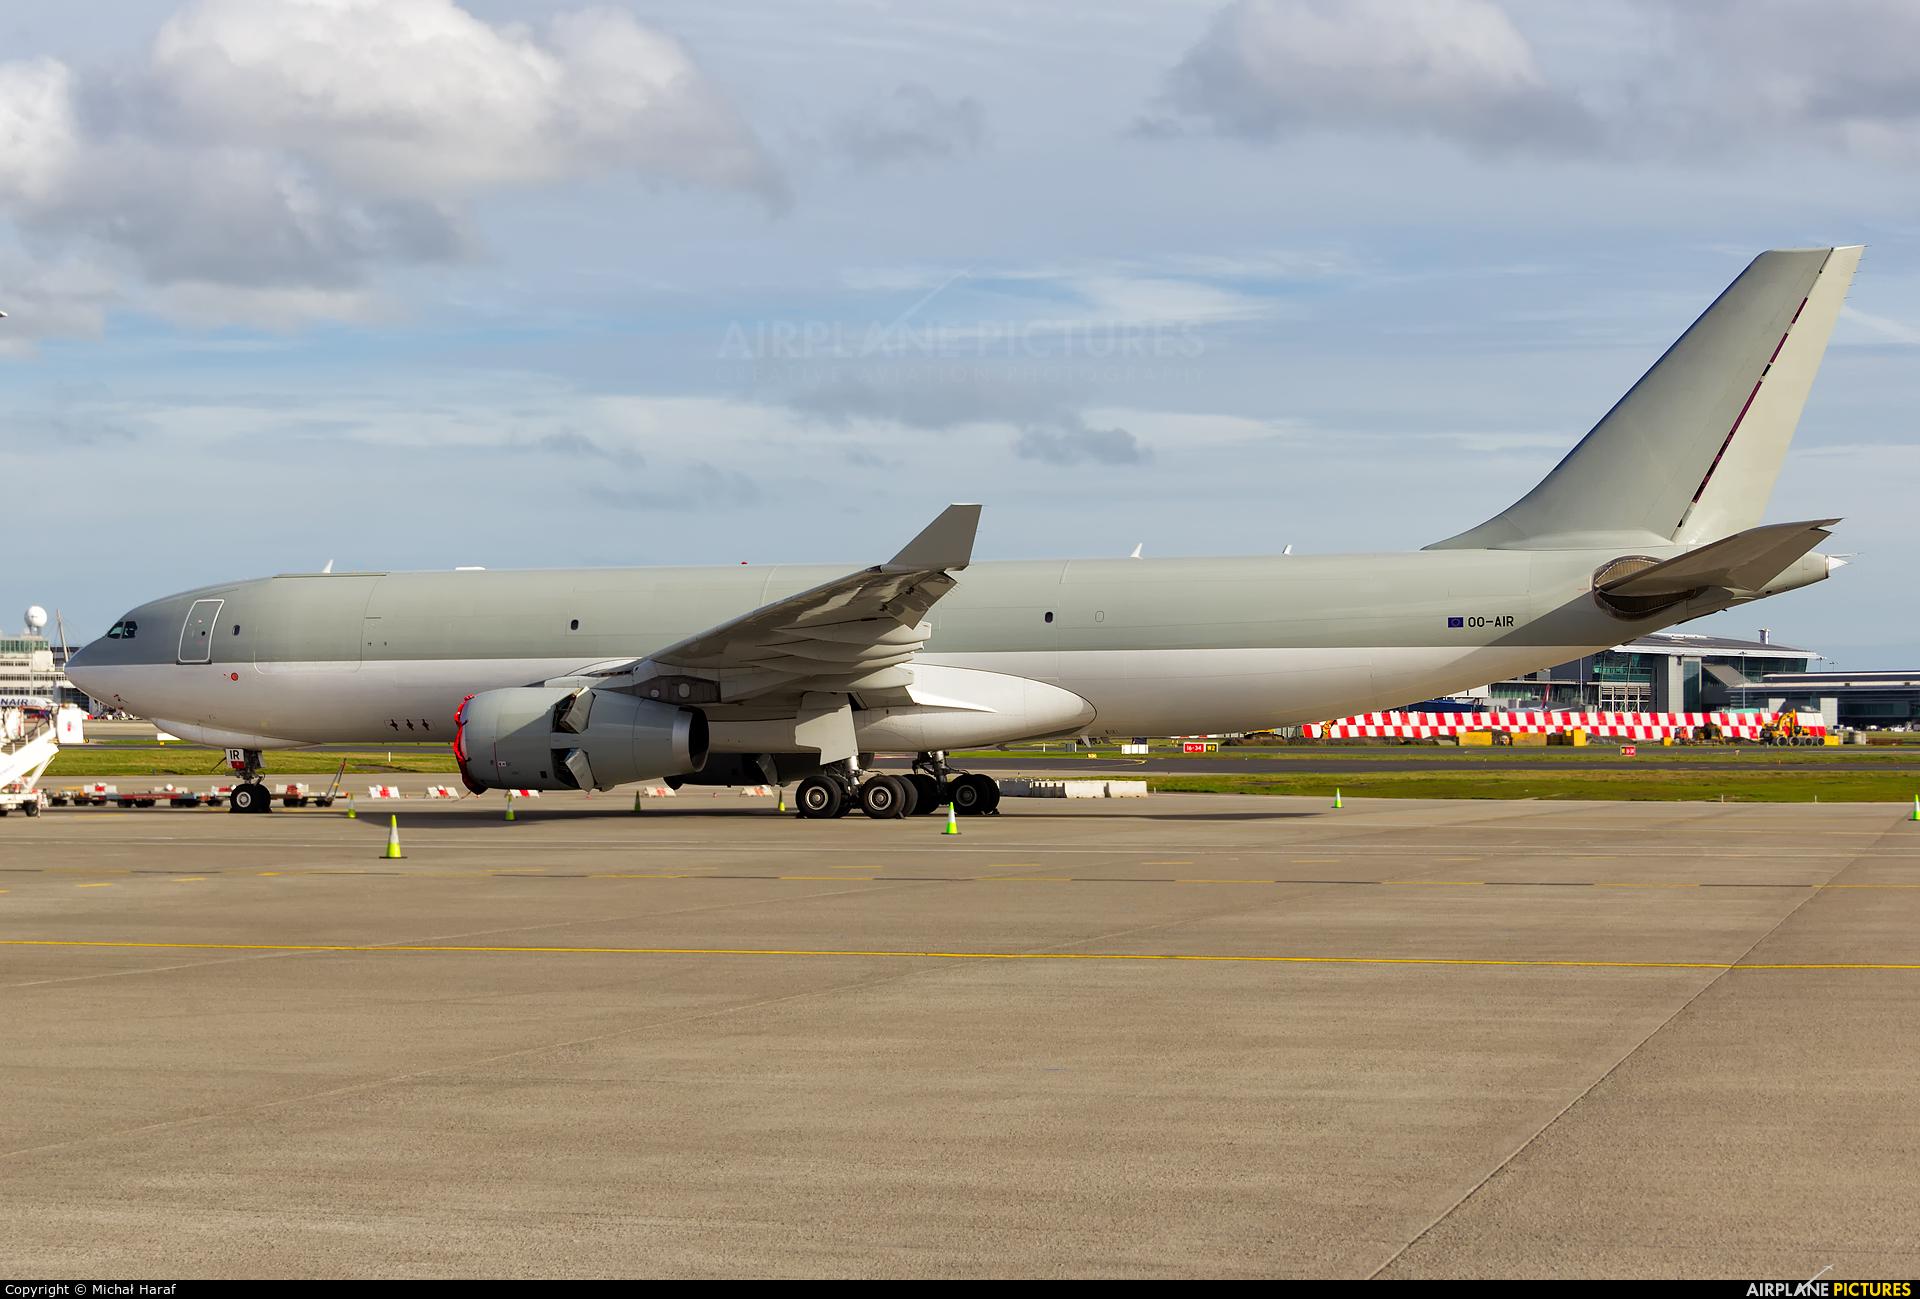 Air Belgium OO-AIR aircraft at Dublin